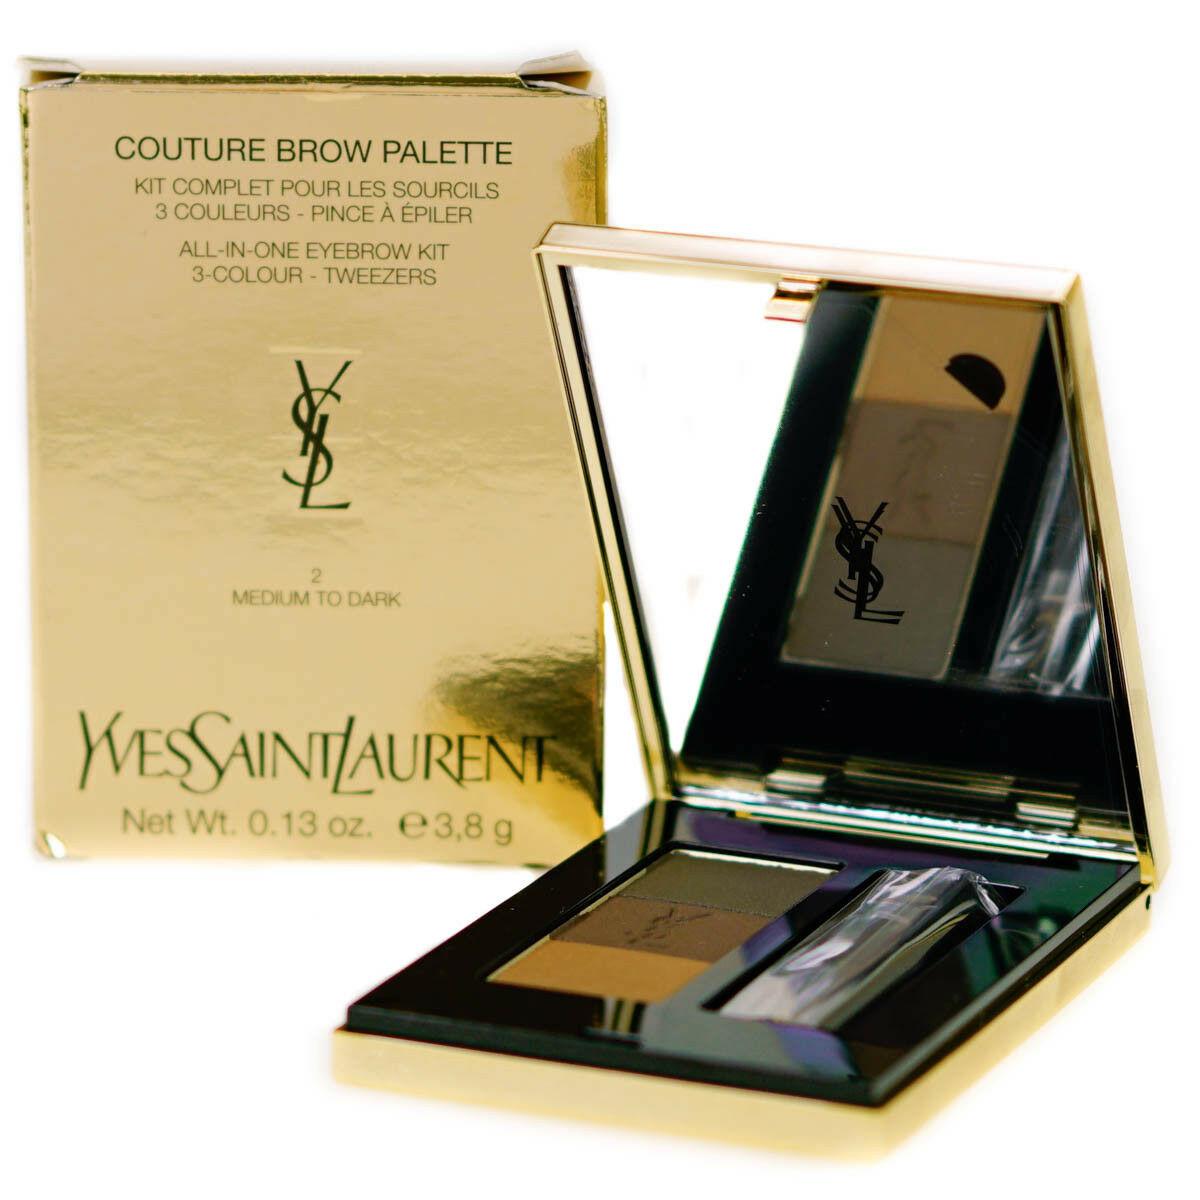 Yves Saint Laurent Couture Brow Palette 2 Medium To Dark